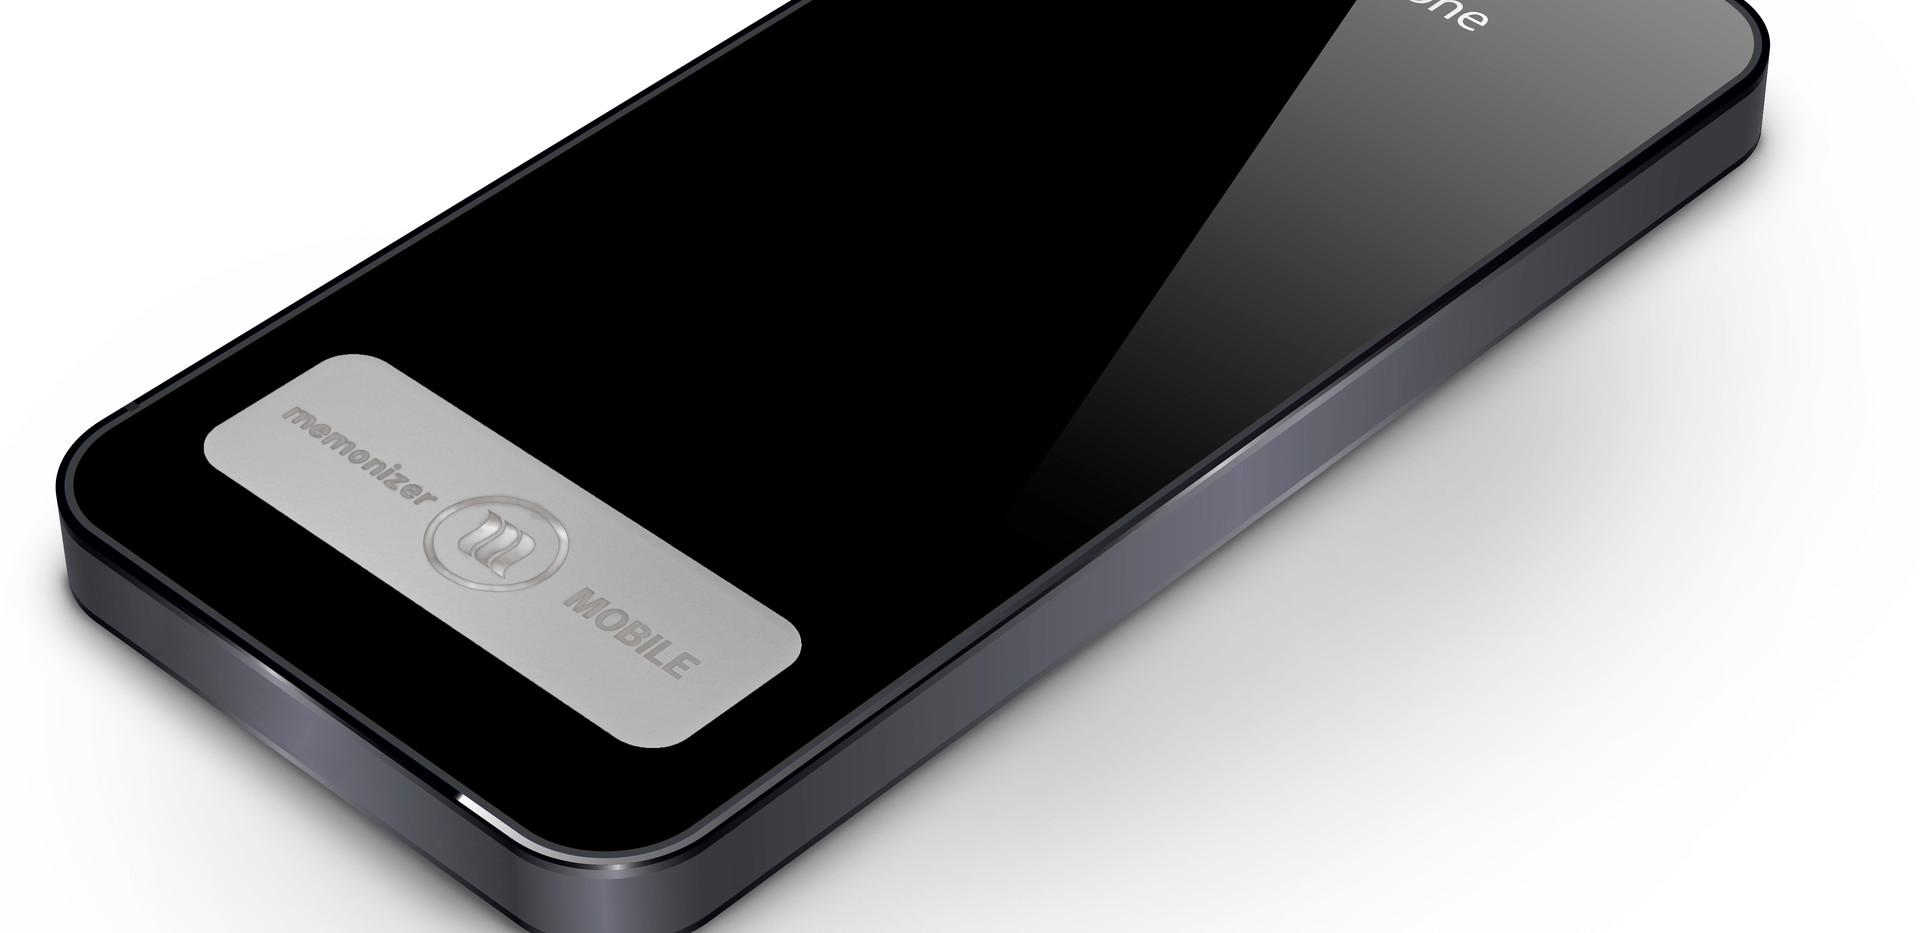 memonizerMOBILE on Smartphone